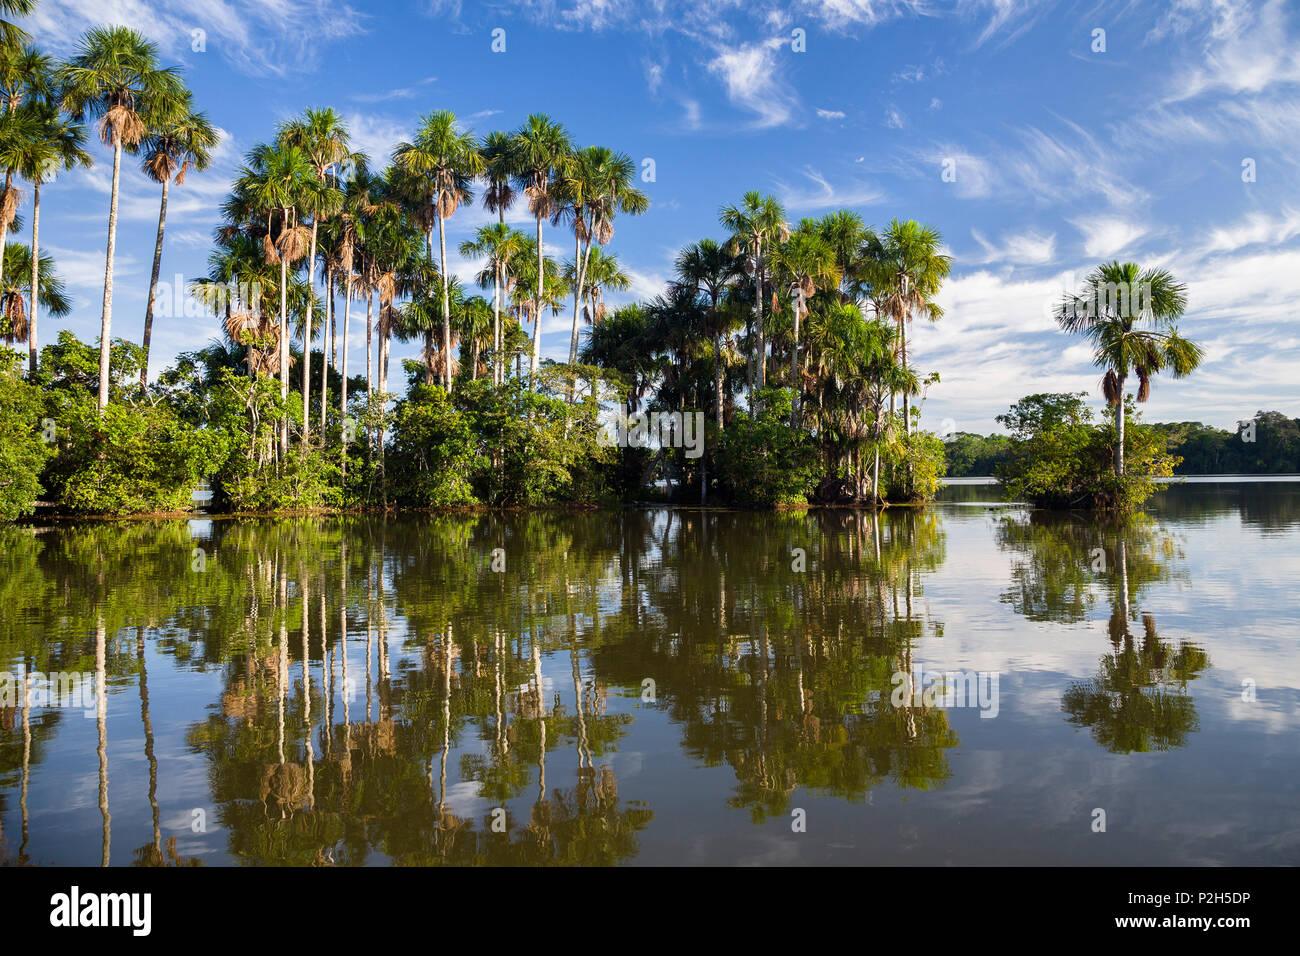 Mauriti Palmen, Buriti, moriche Palmen, an Sandoval Lake, Mauritia flexuosa, Tambopata National Reserve, Peru, Südamerika Stockbild